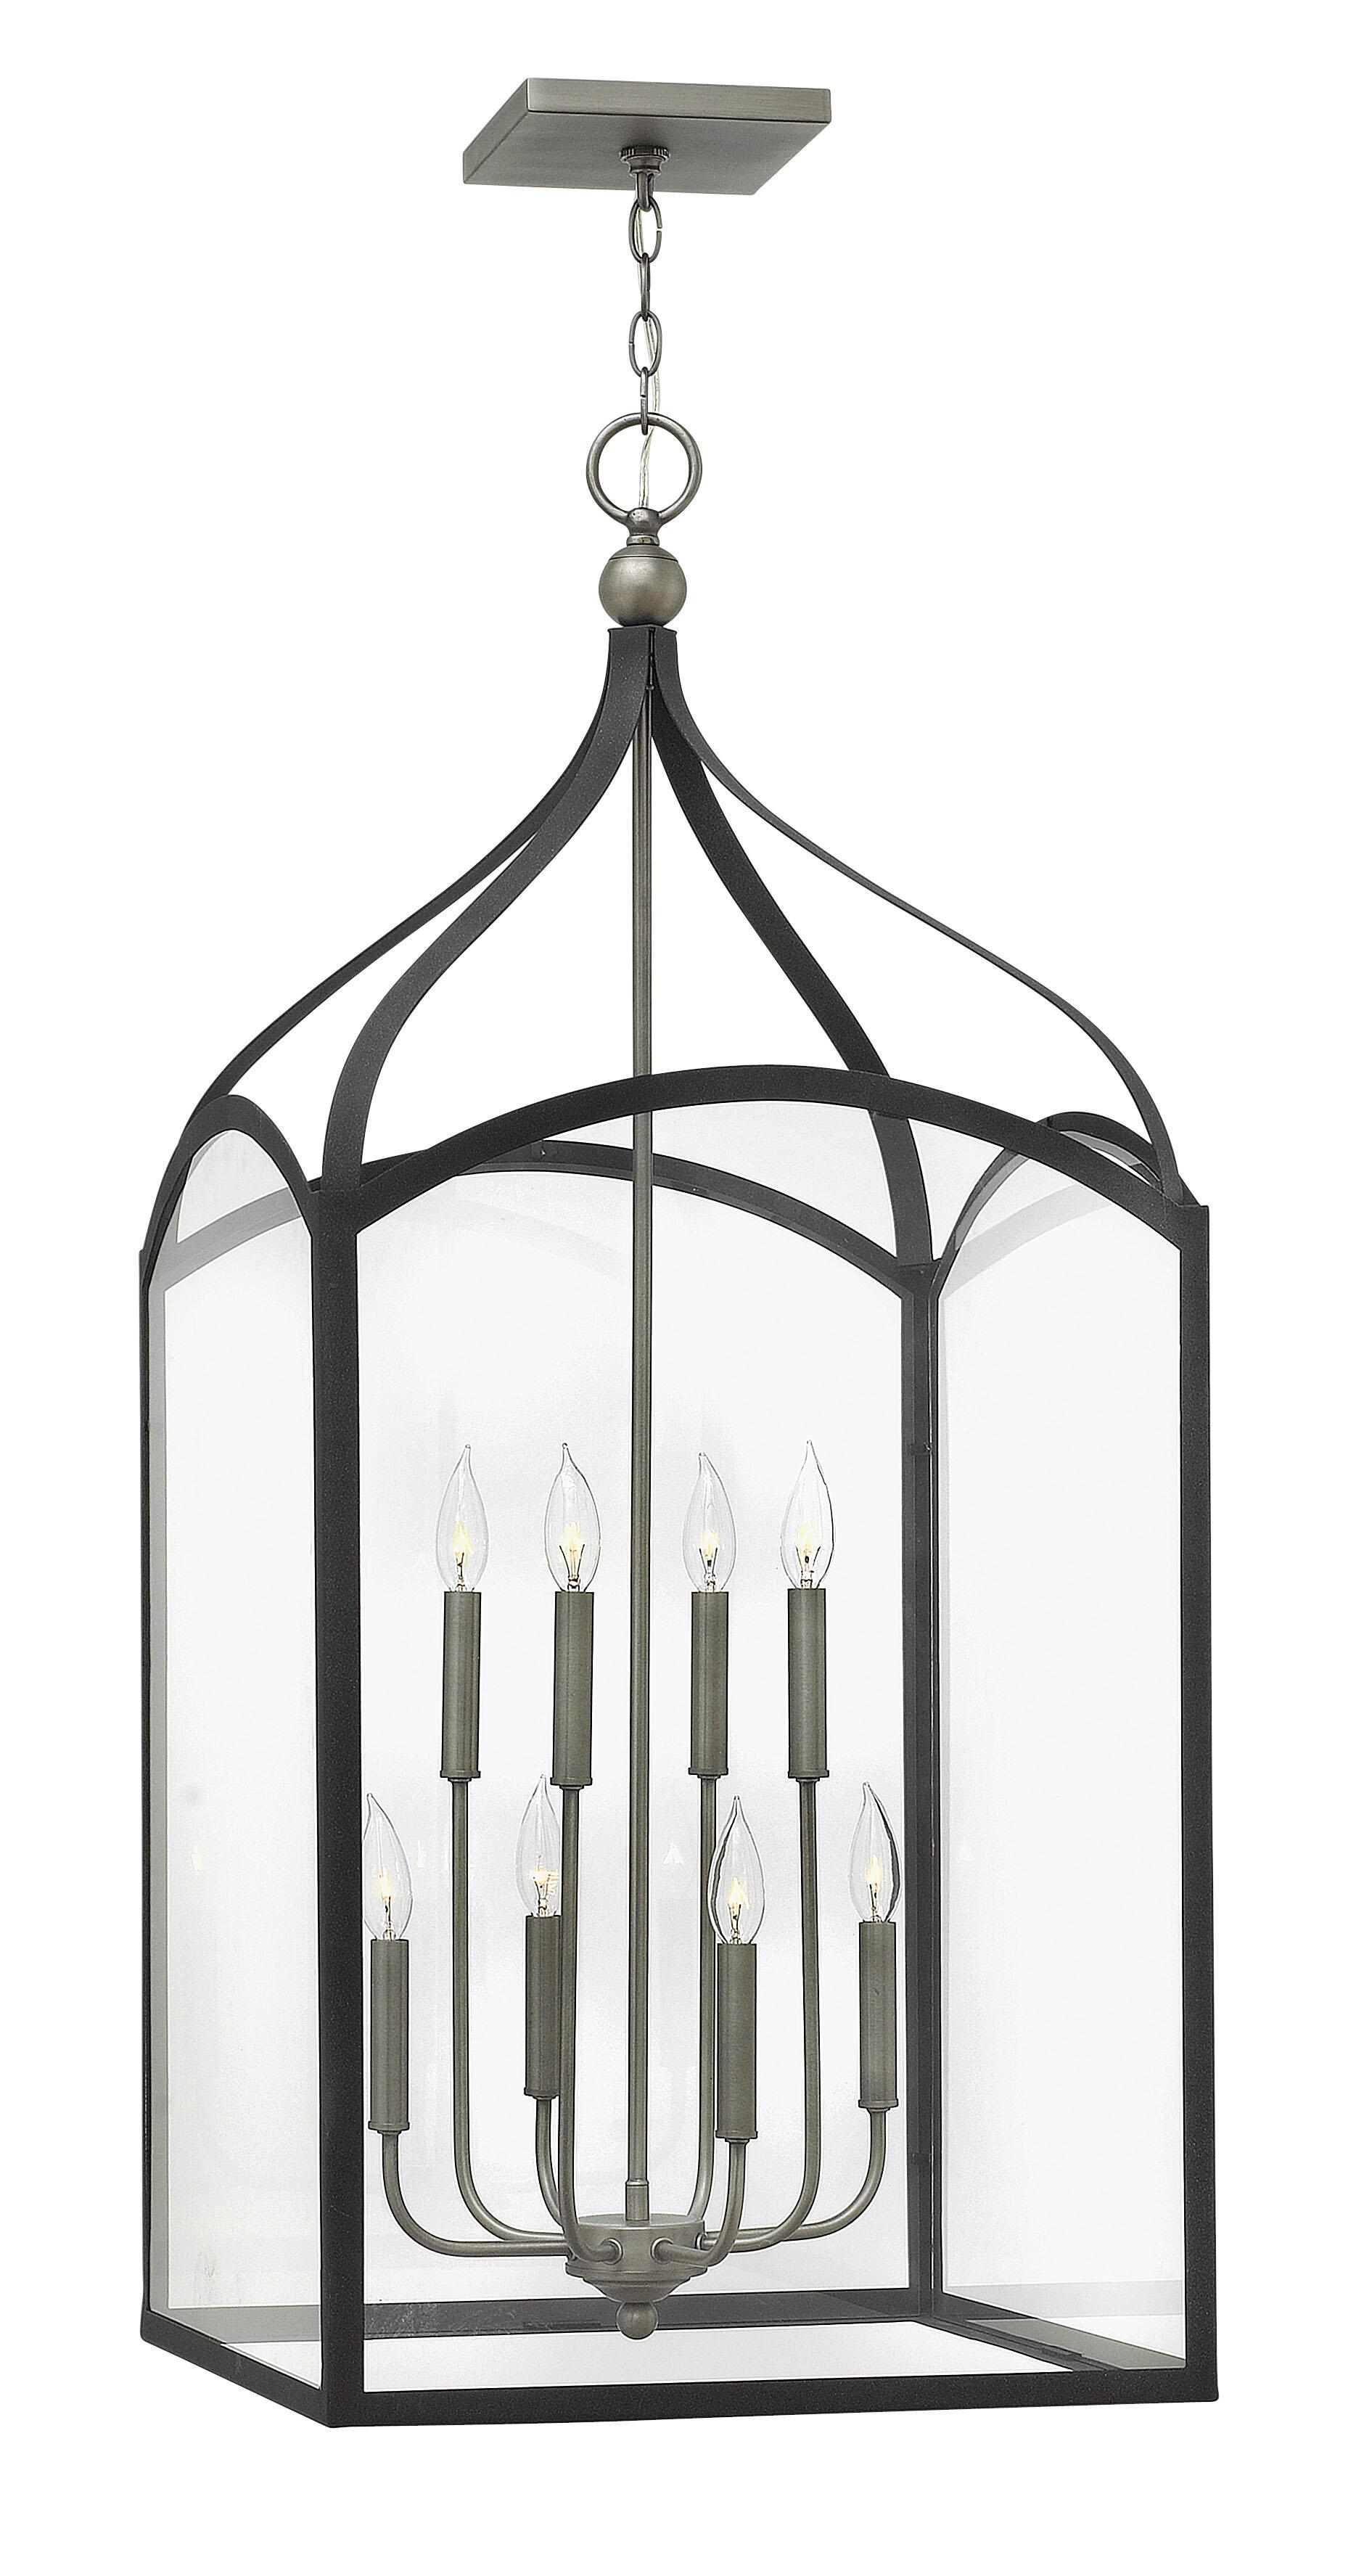 Gracie Oaks Jeremie 8 Light Lantern Rectangle Chandelier Reviews Wayfair